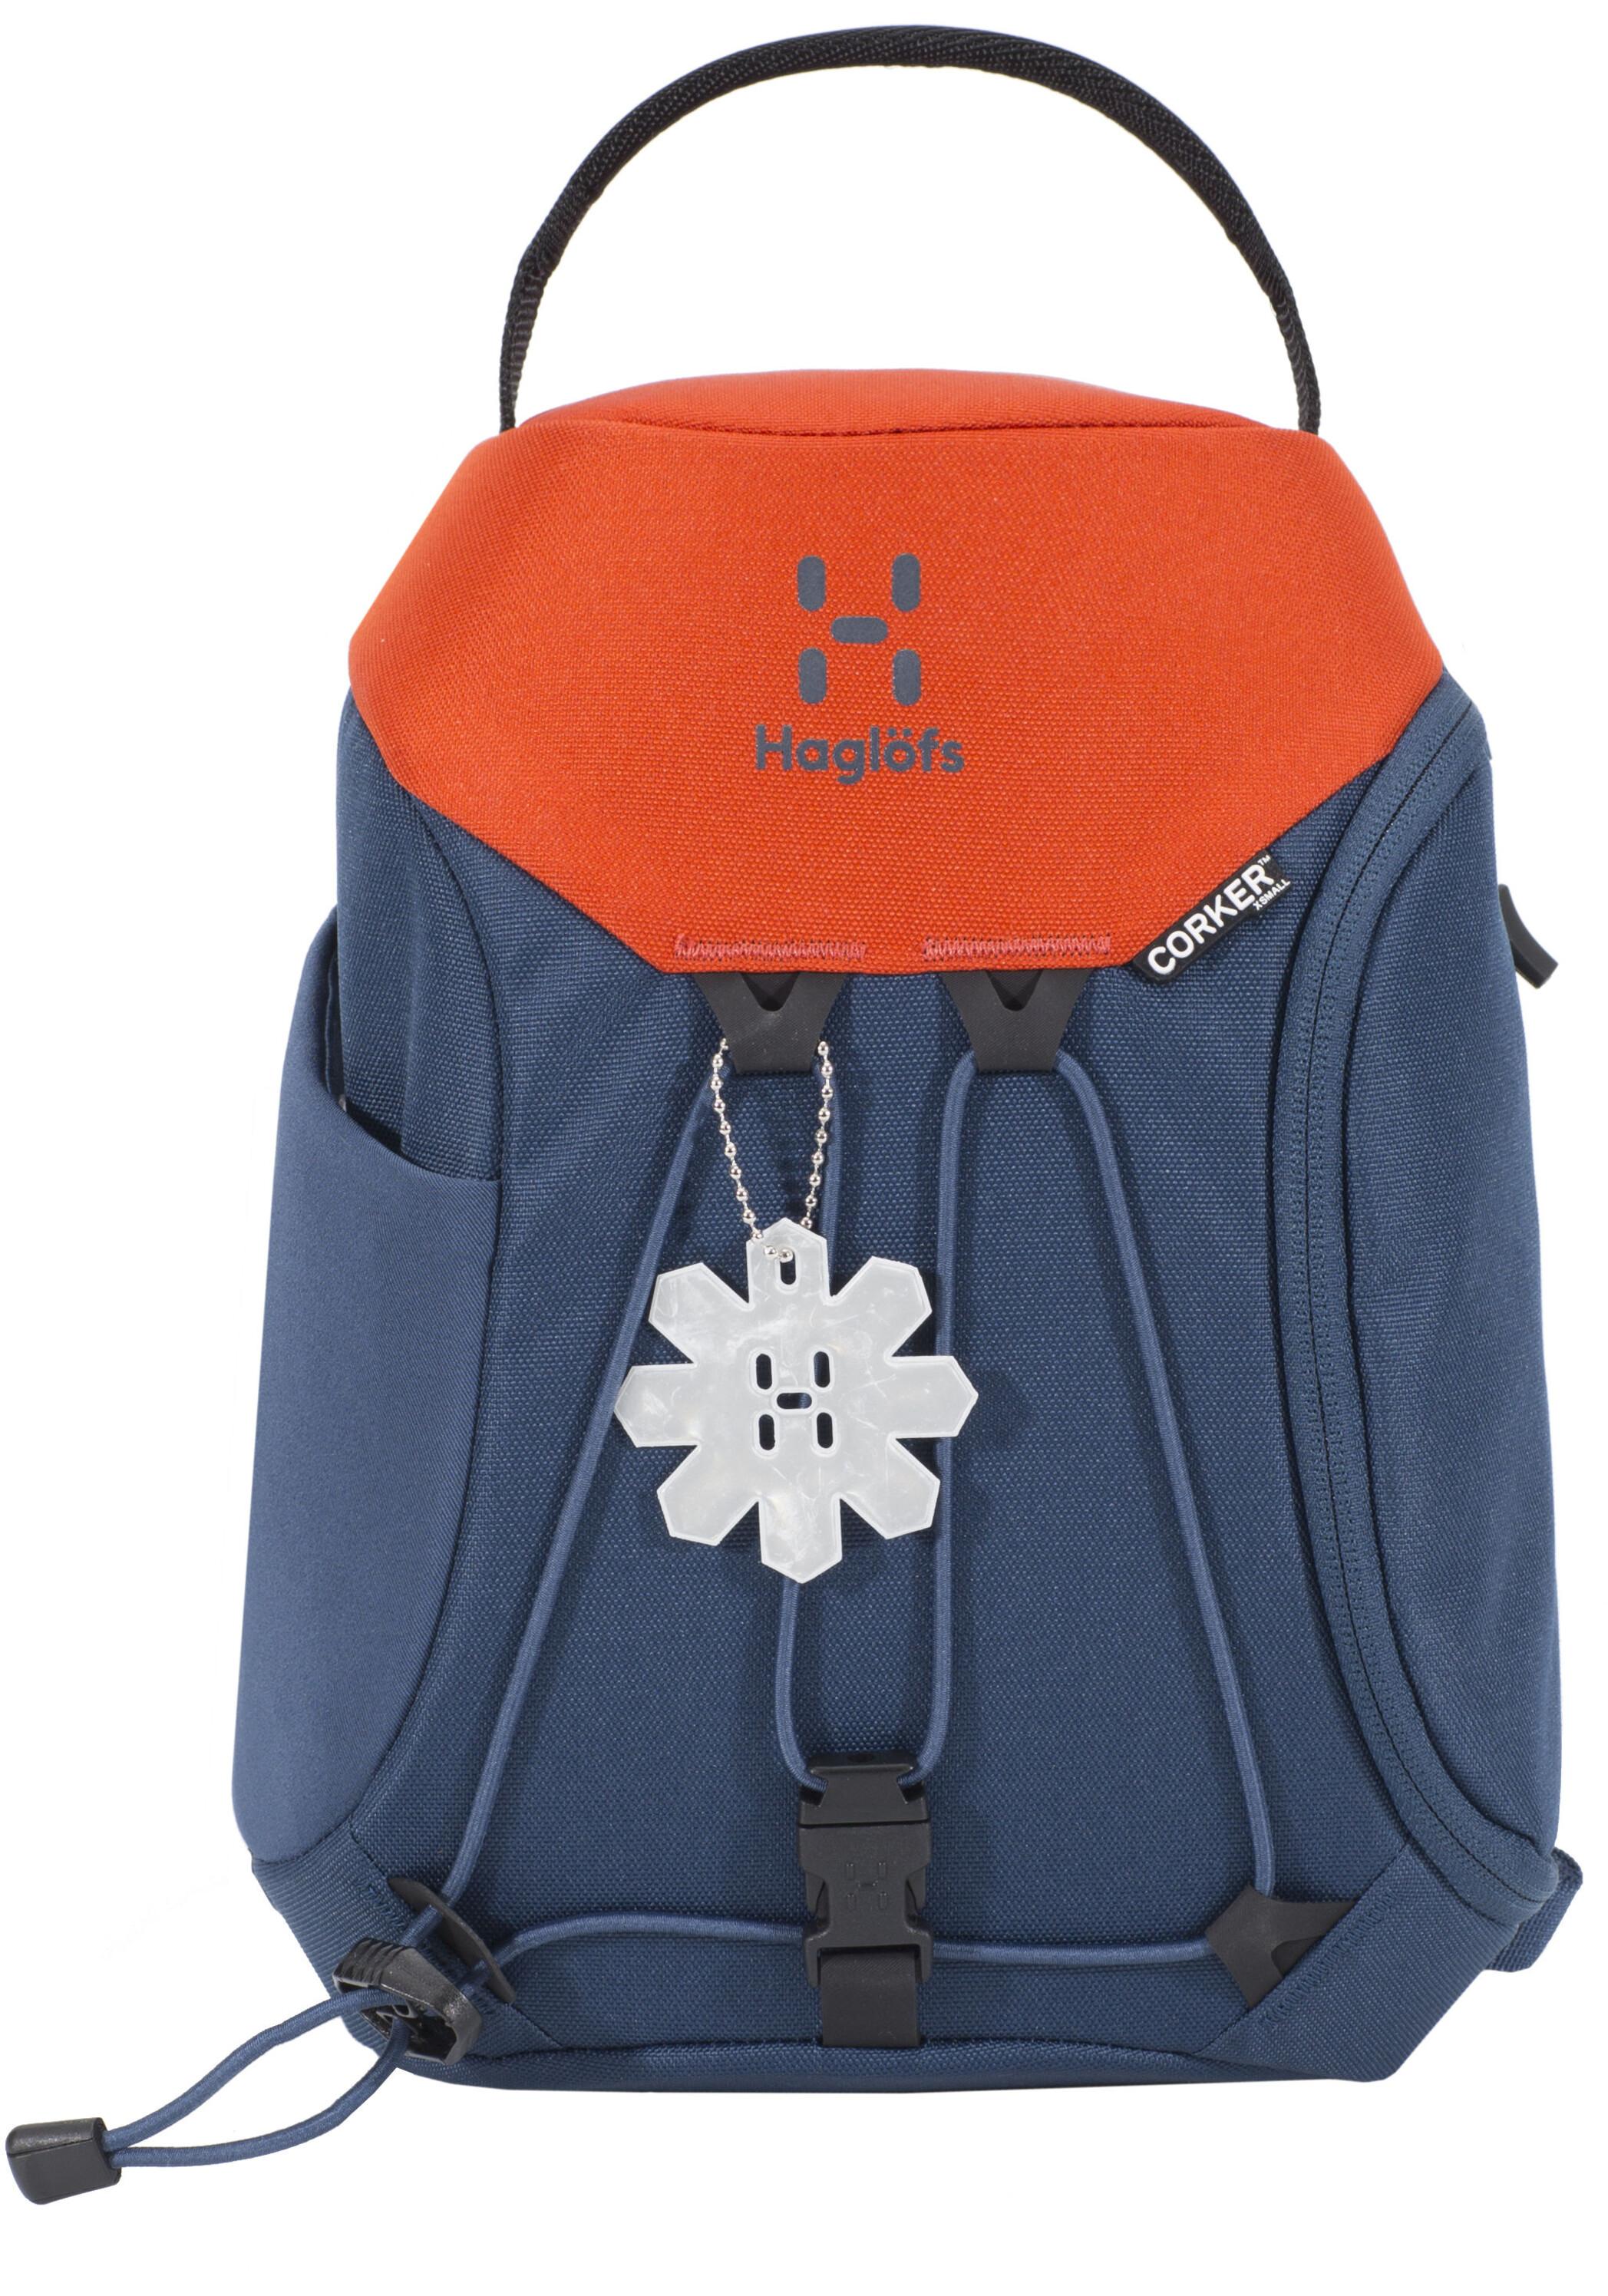 Haglofs Corker X Small Backpack Children 5l Blue At Bikester Co Uk